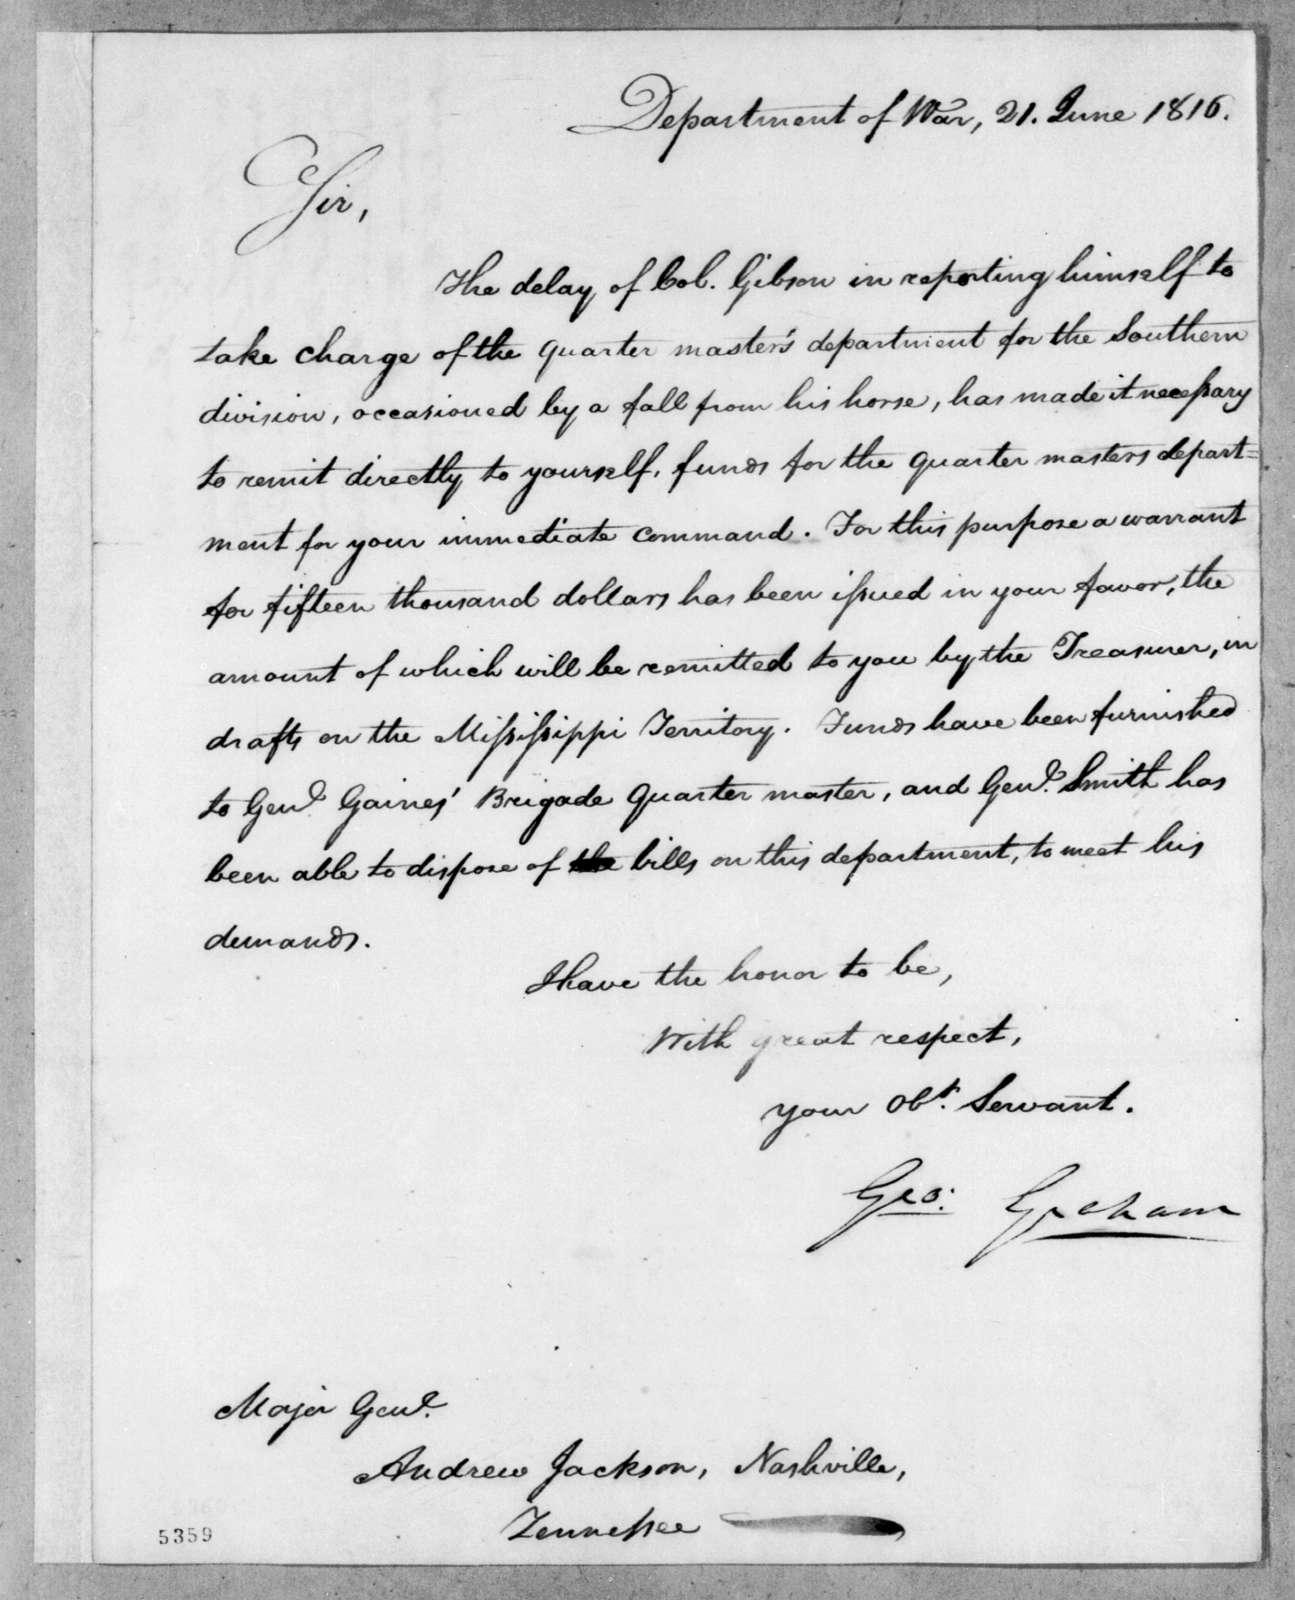 George Graham to Andrew Jackson, June 21, 1816